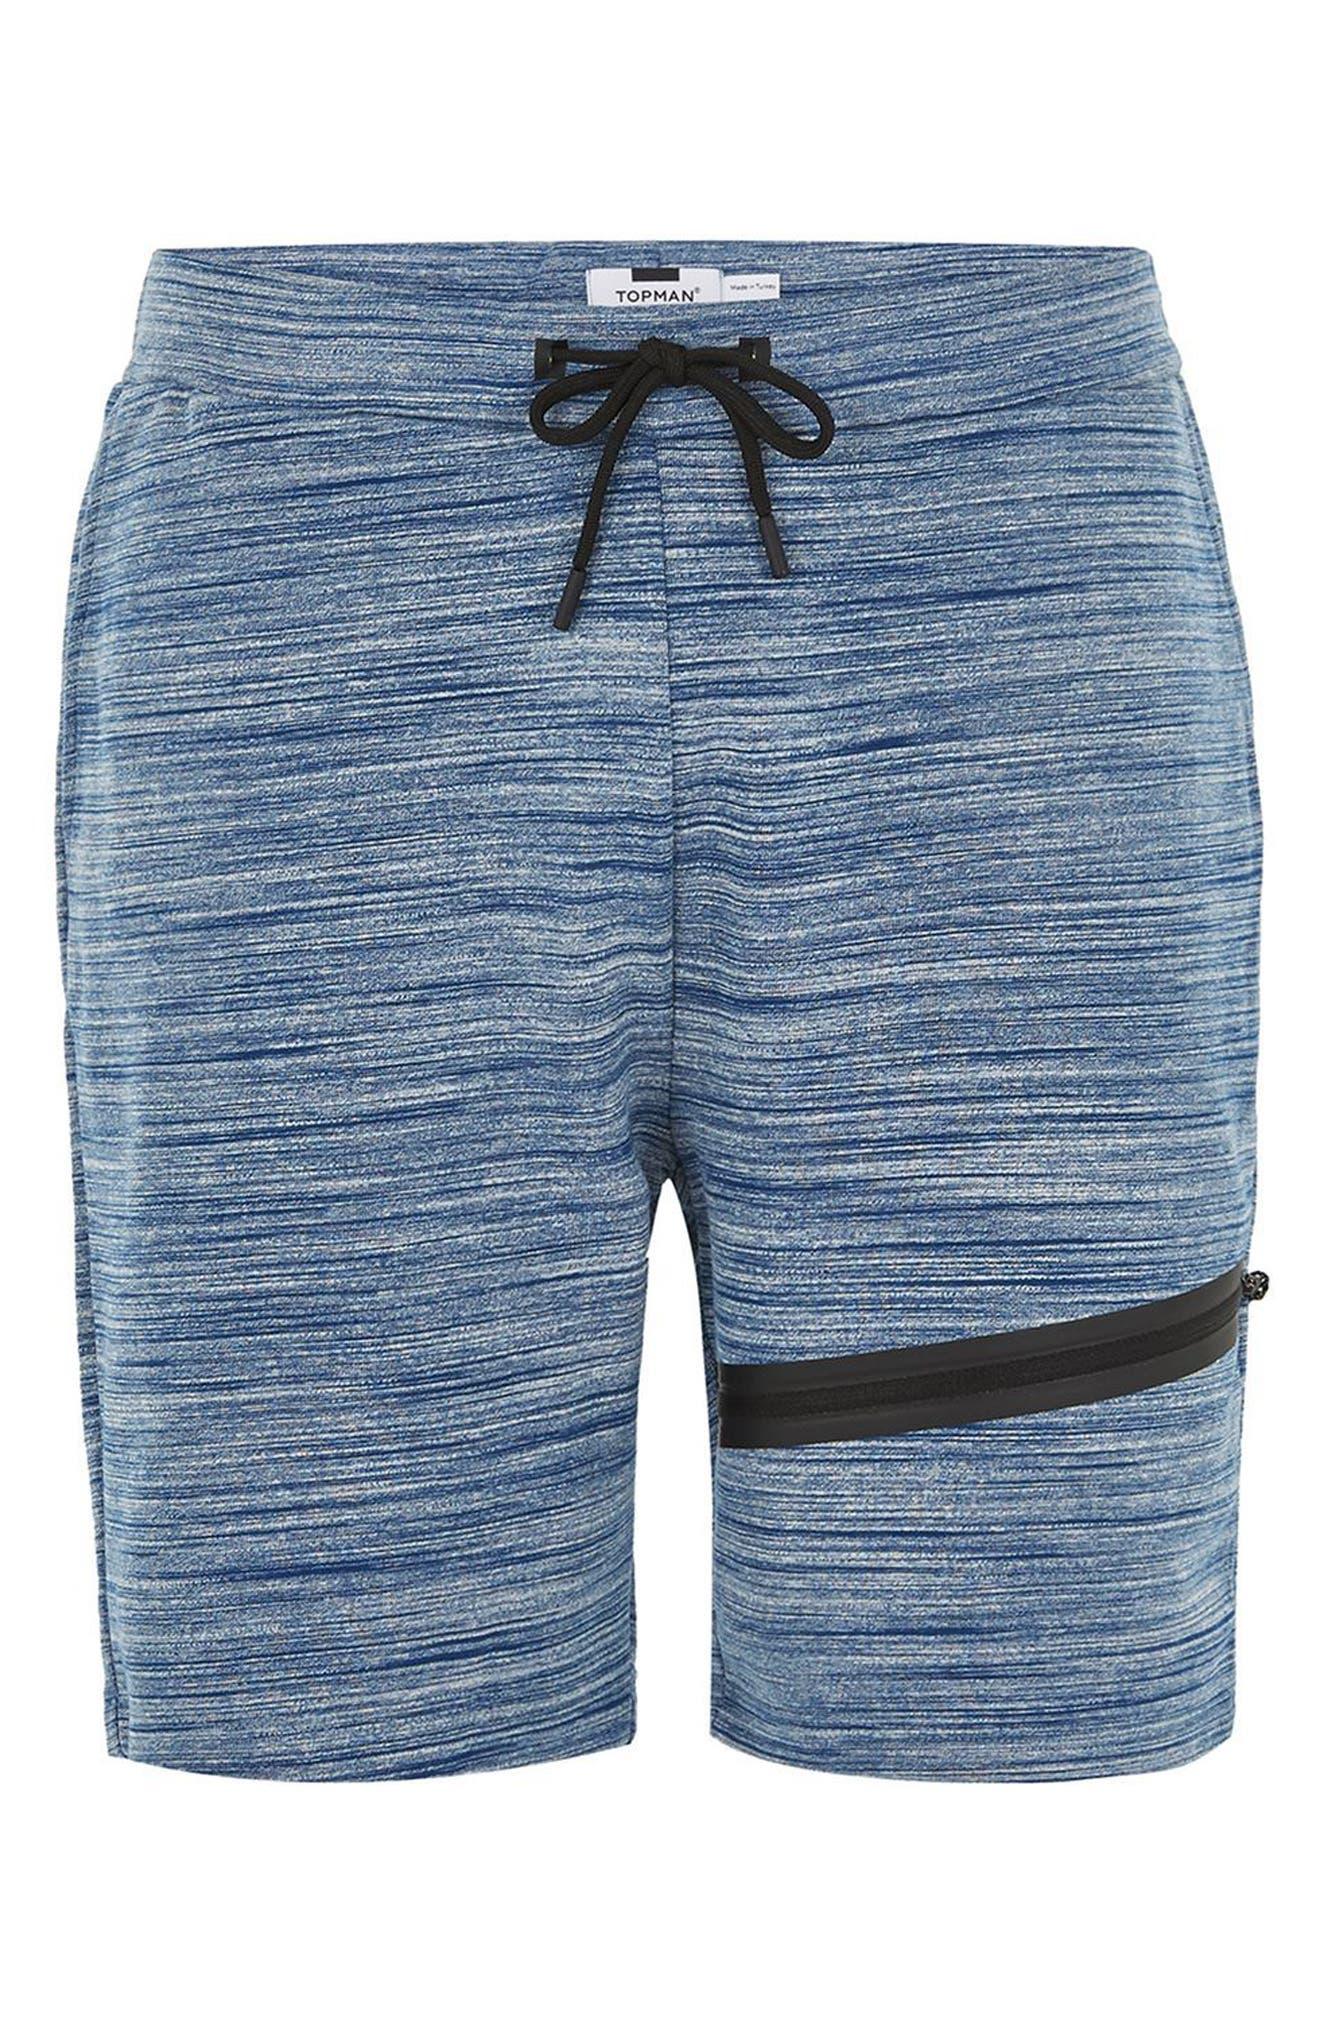 Space Dye Tech Shorts,                             Alternate thumbnail 4, color,                             Mid Blue